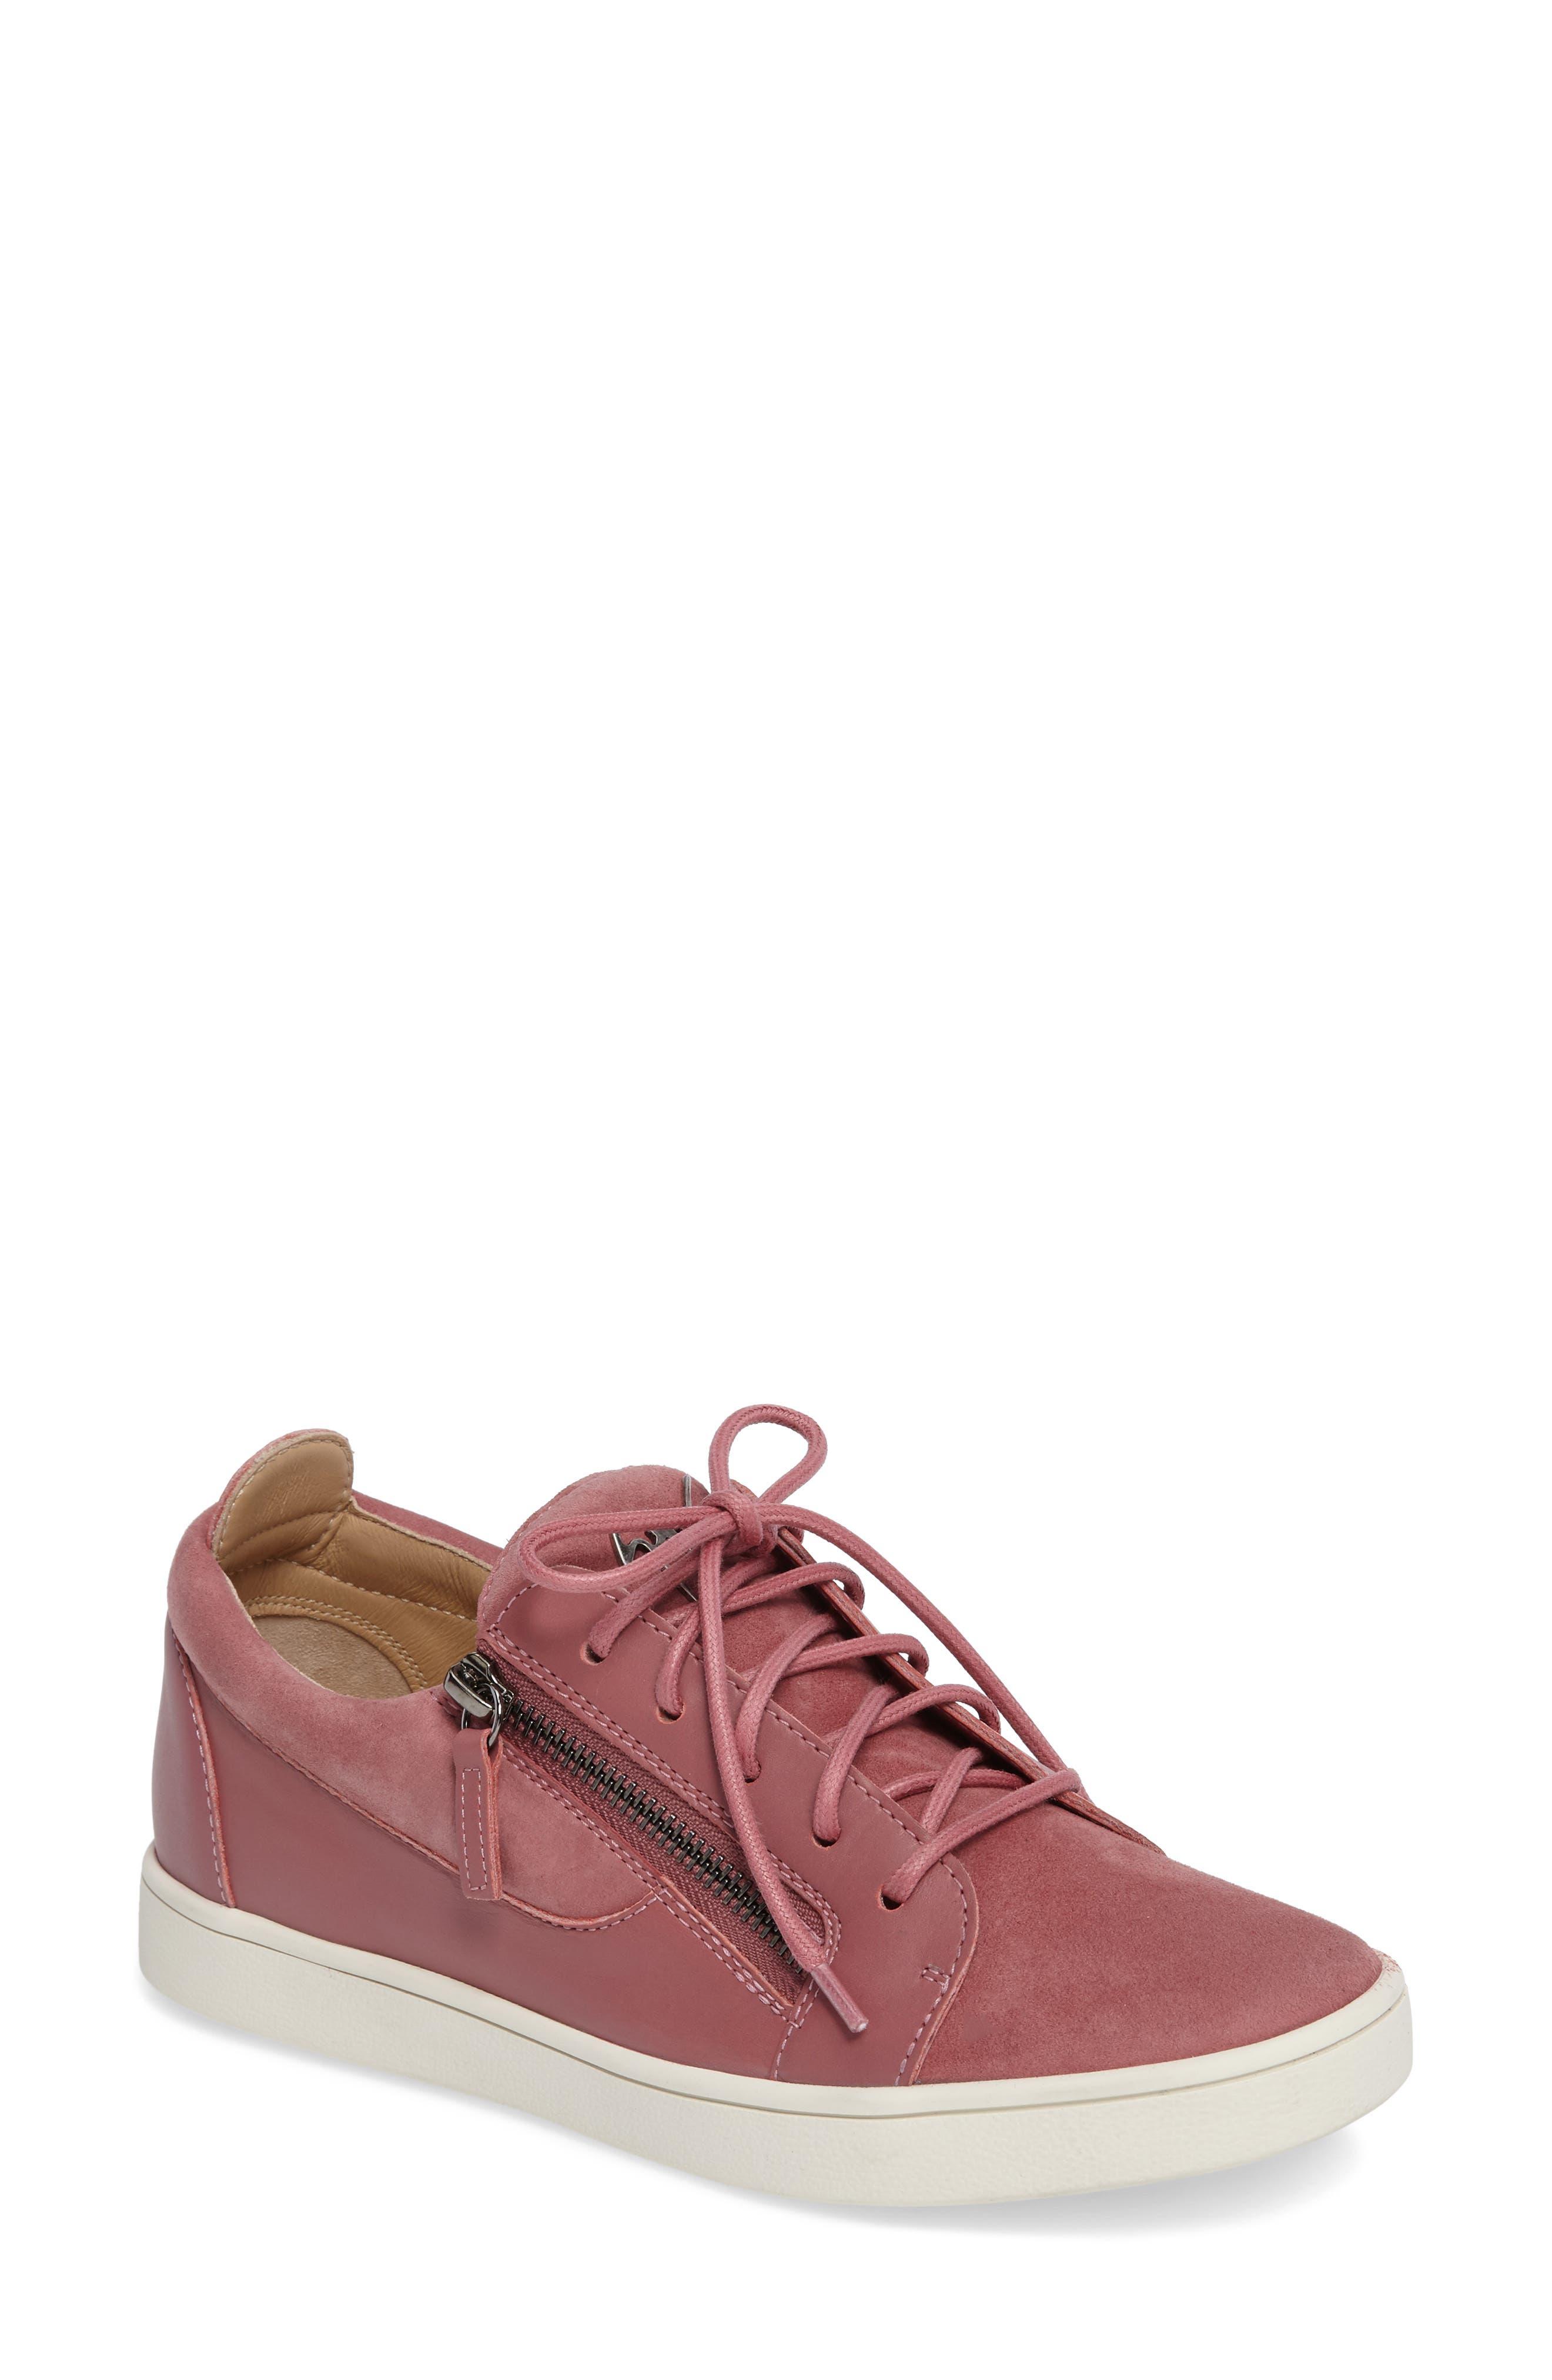 Alternate Image 1 Selected - Giuseppe Zanotti Low Top Zip Sneaker (Women)